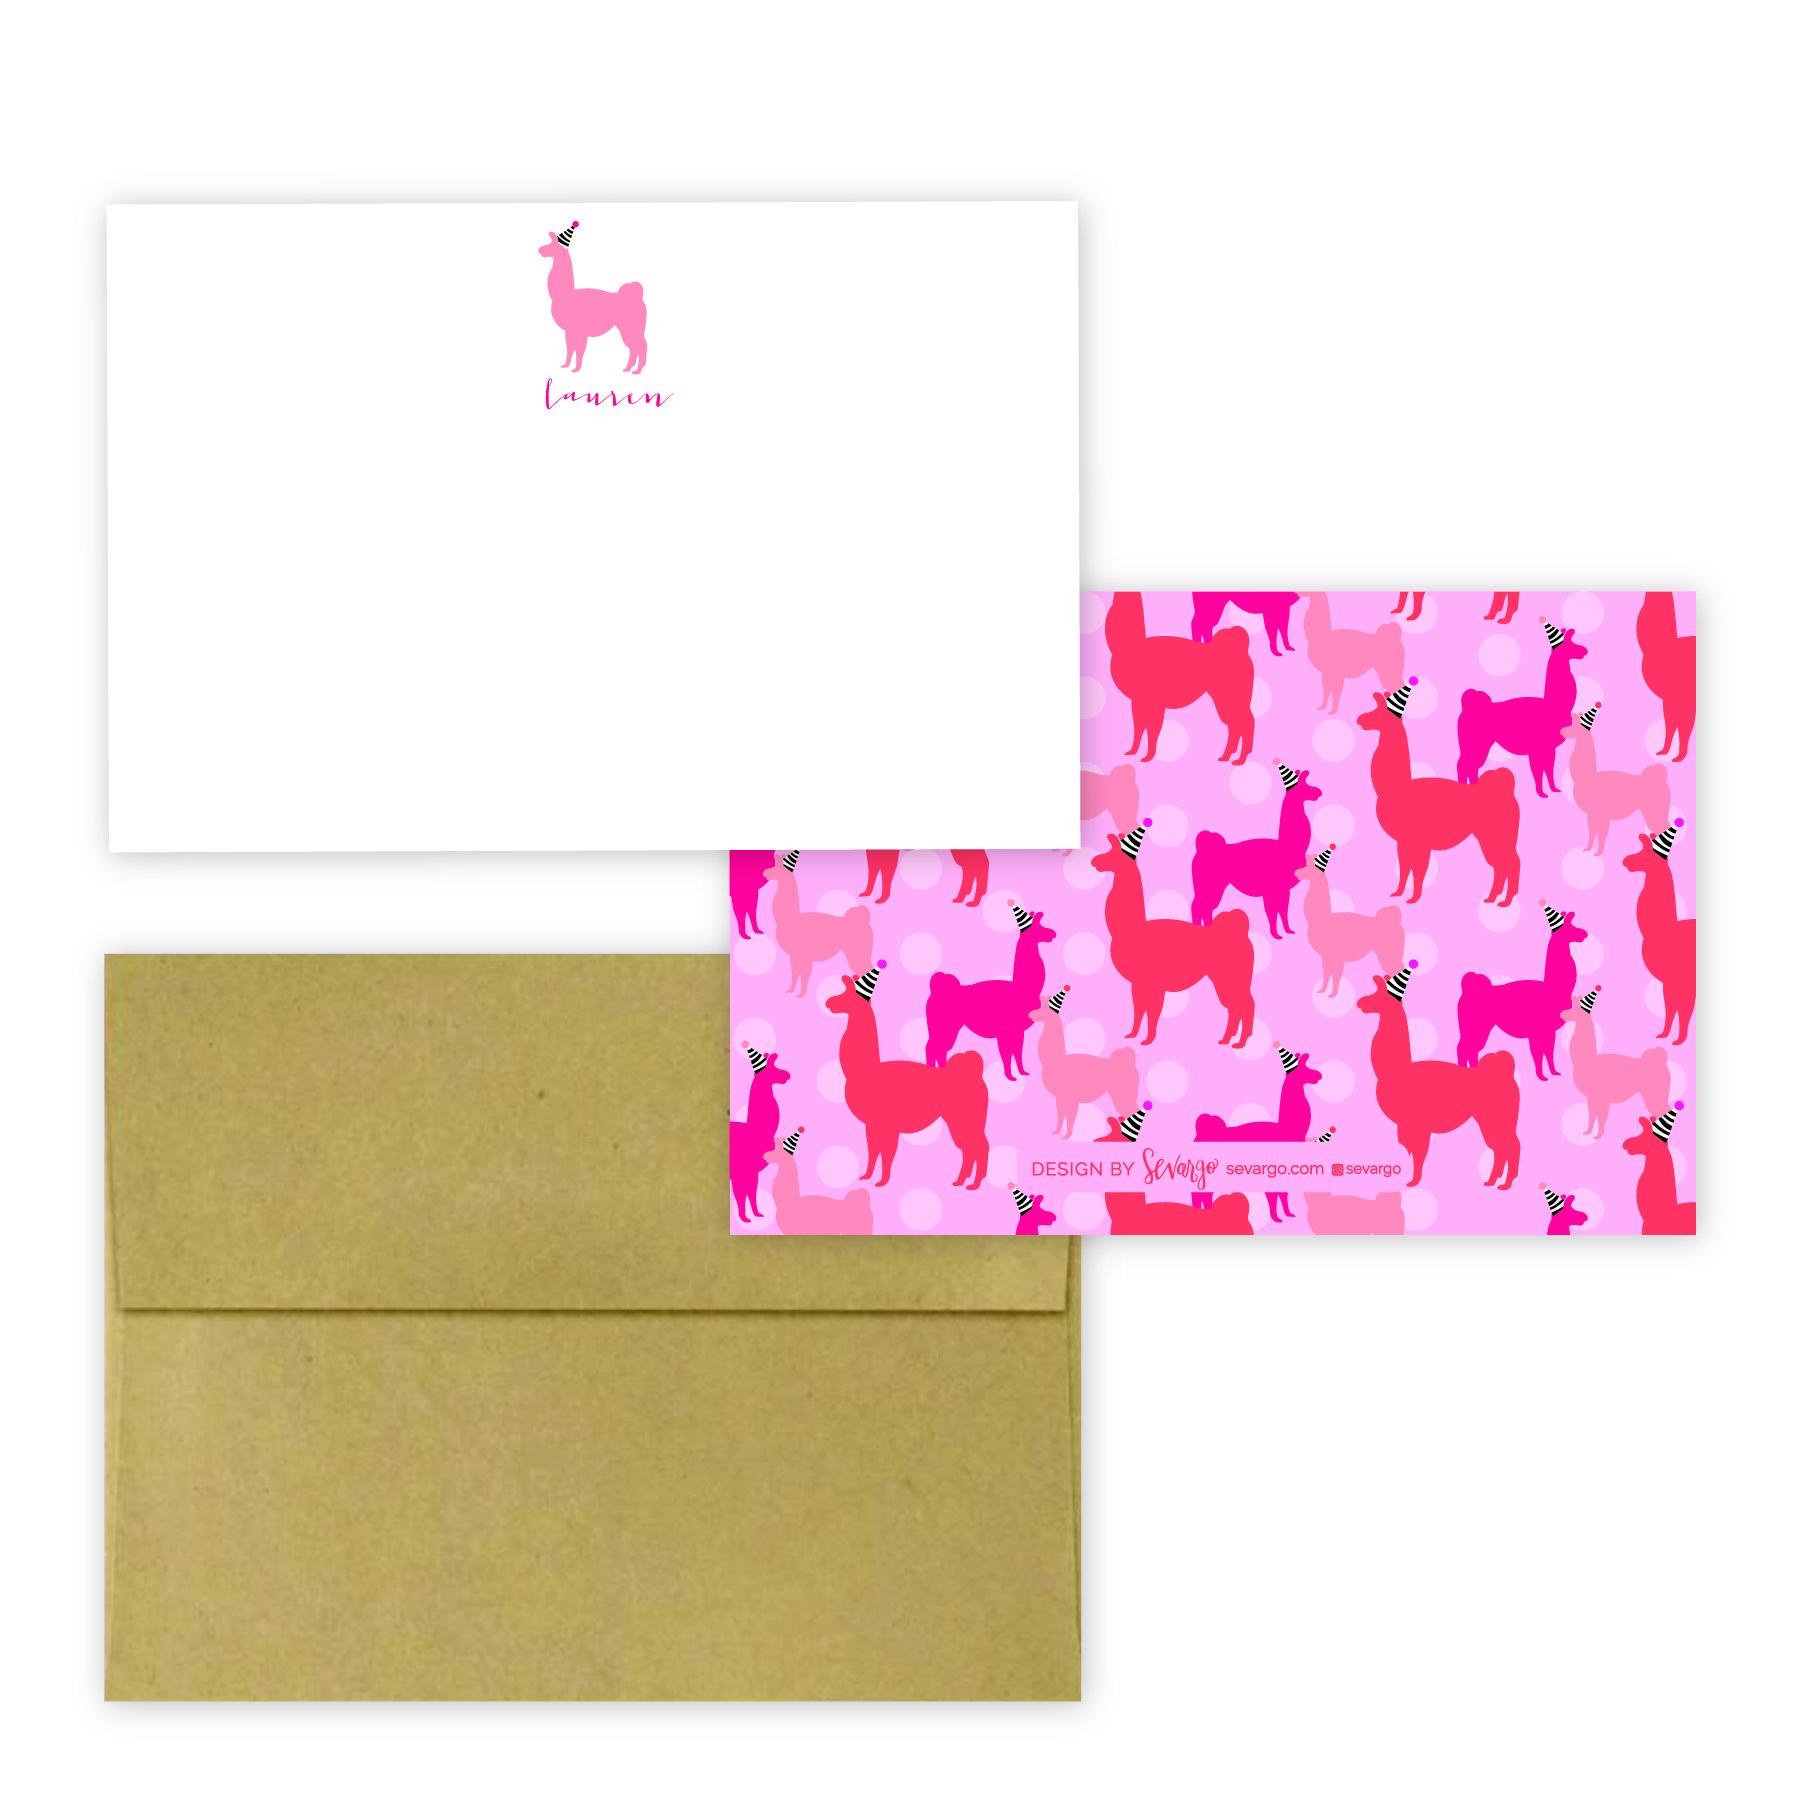 Pink llama stationery-01-01.jpg